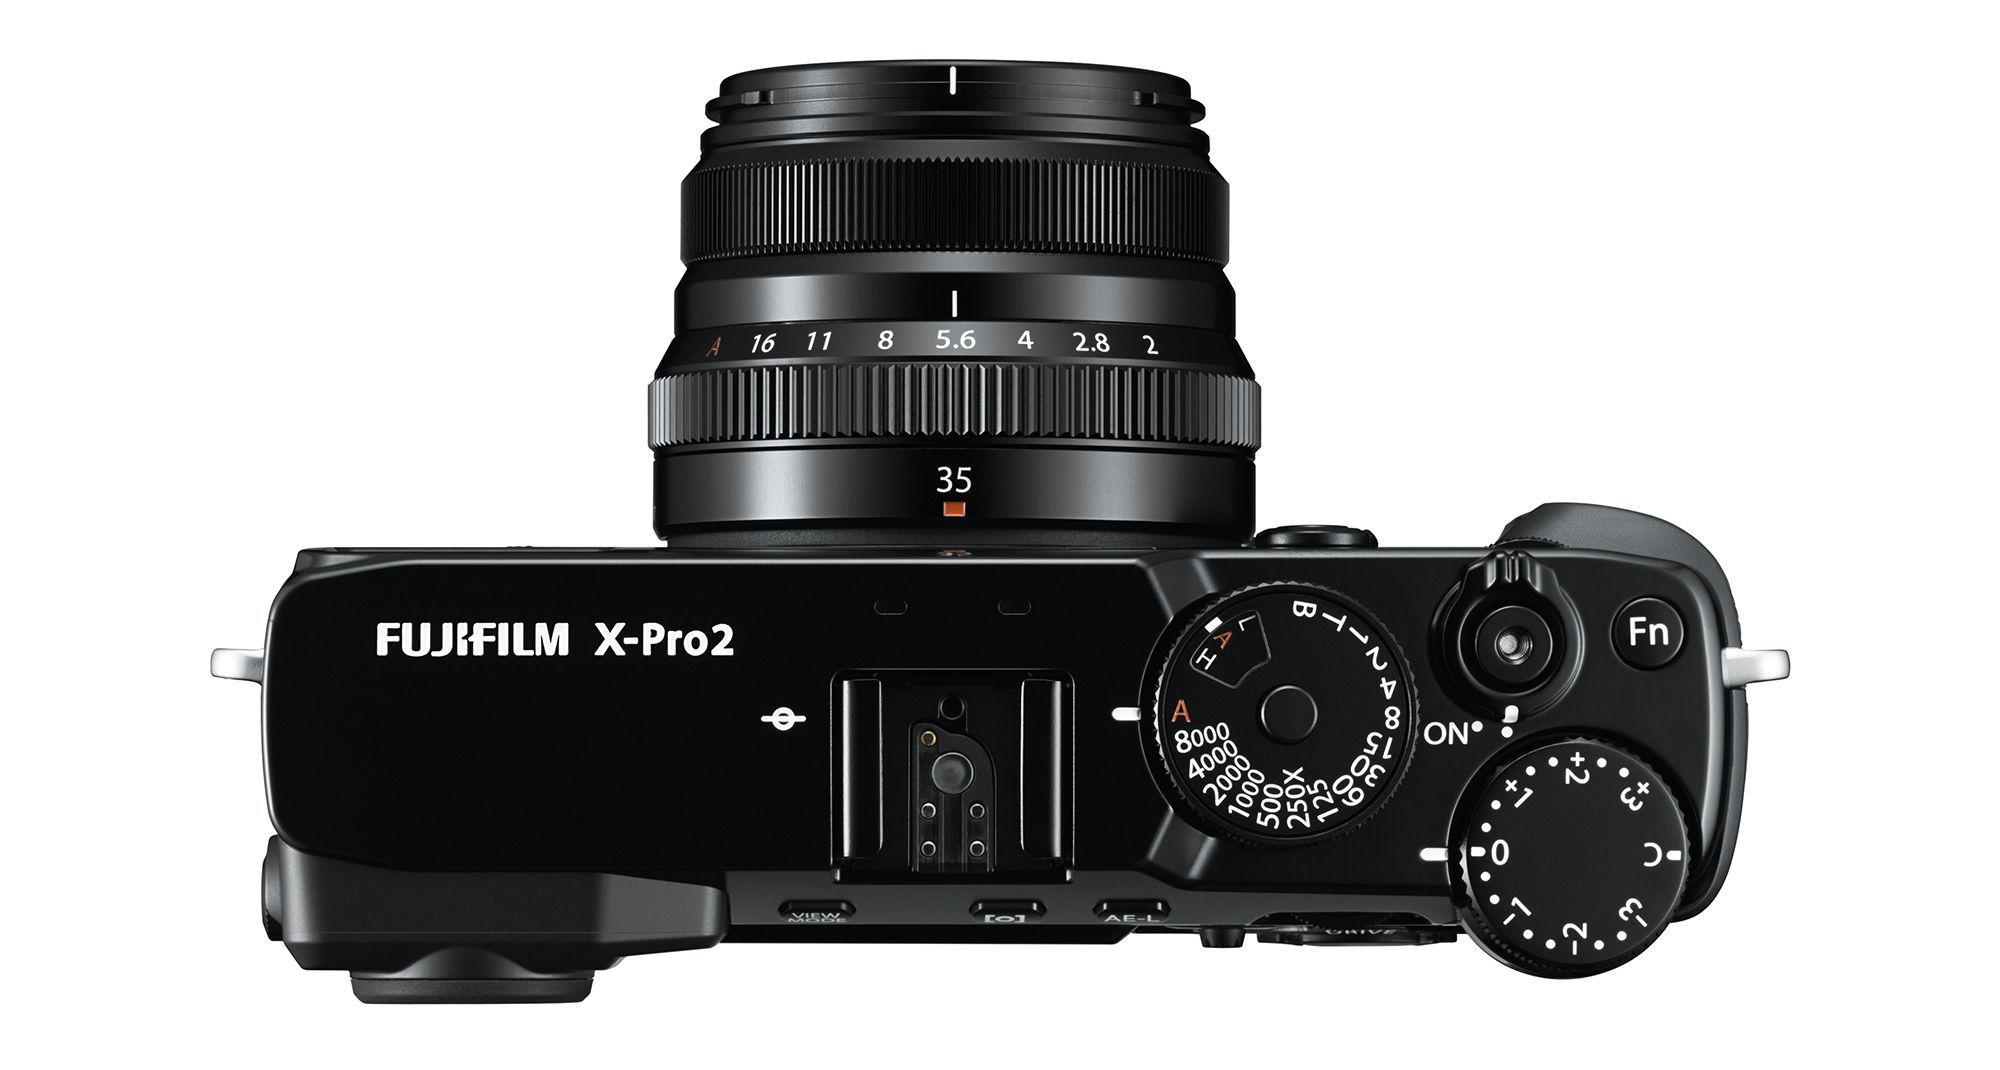 08_X-Pro2_BK_Top_35mm_White.0